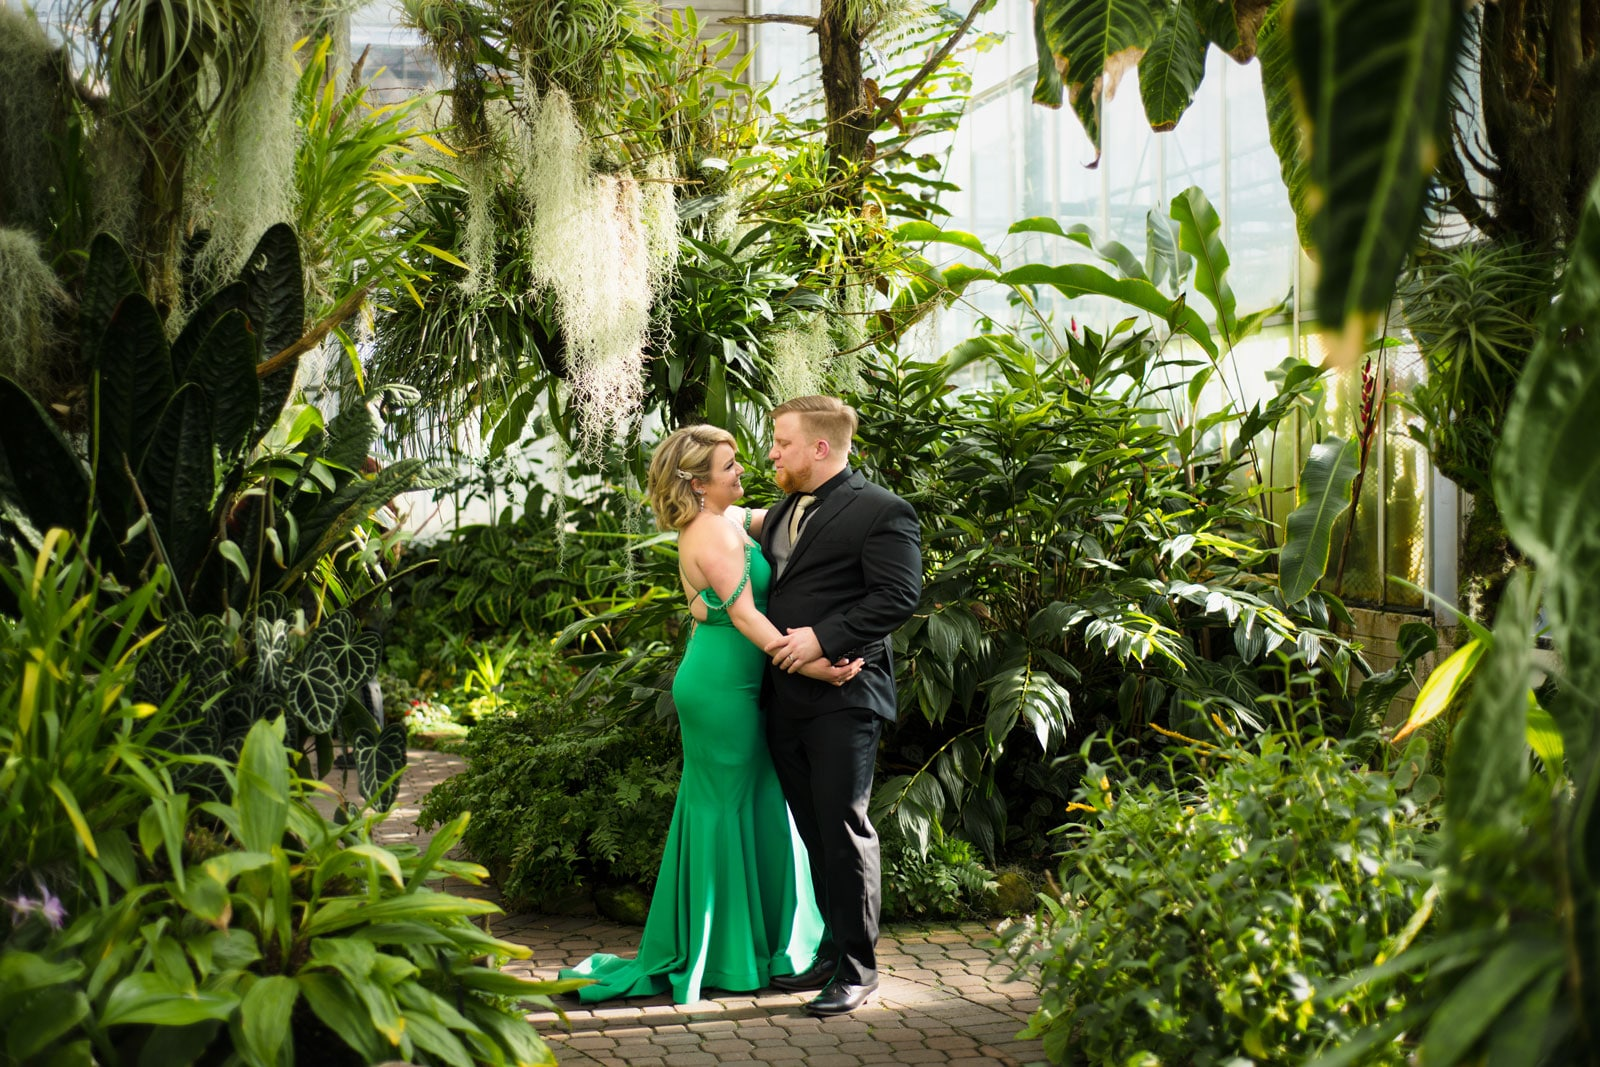 Atlanta Botanical Gardens portrait session for couple's anniversary